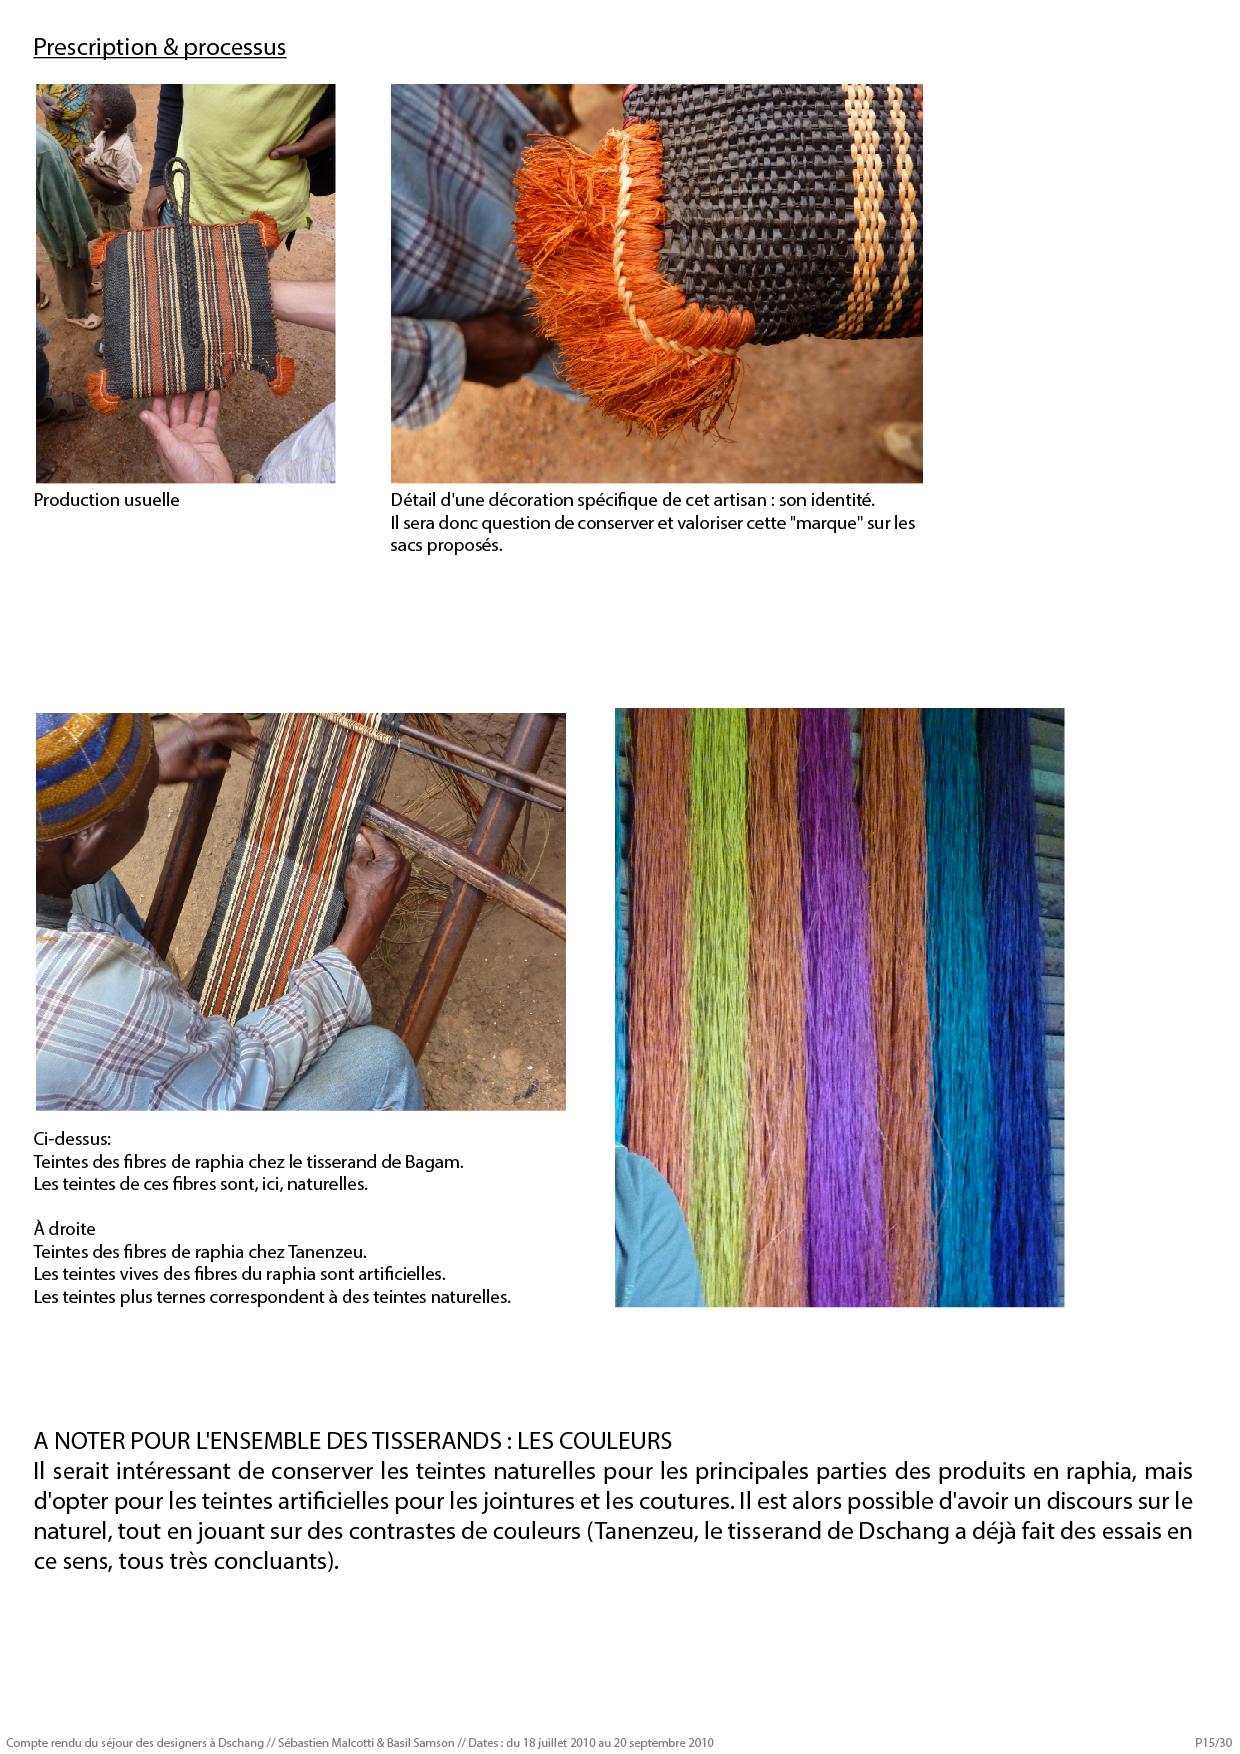 Artisanat Camerounais   Les industries créatives